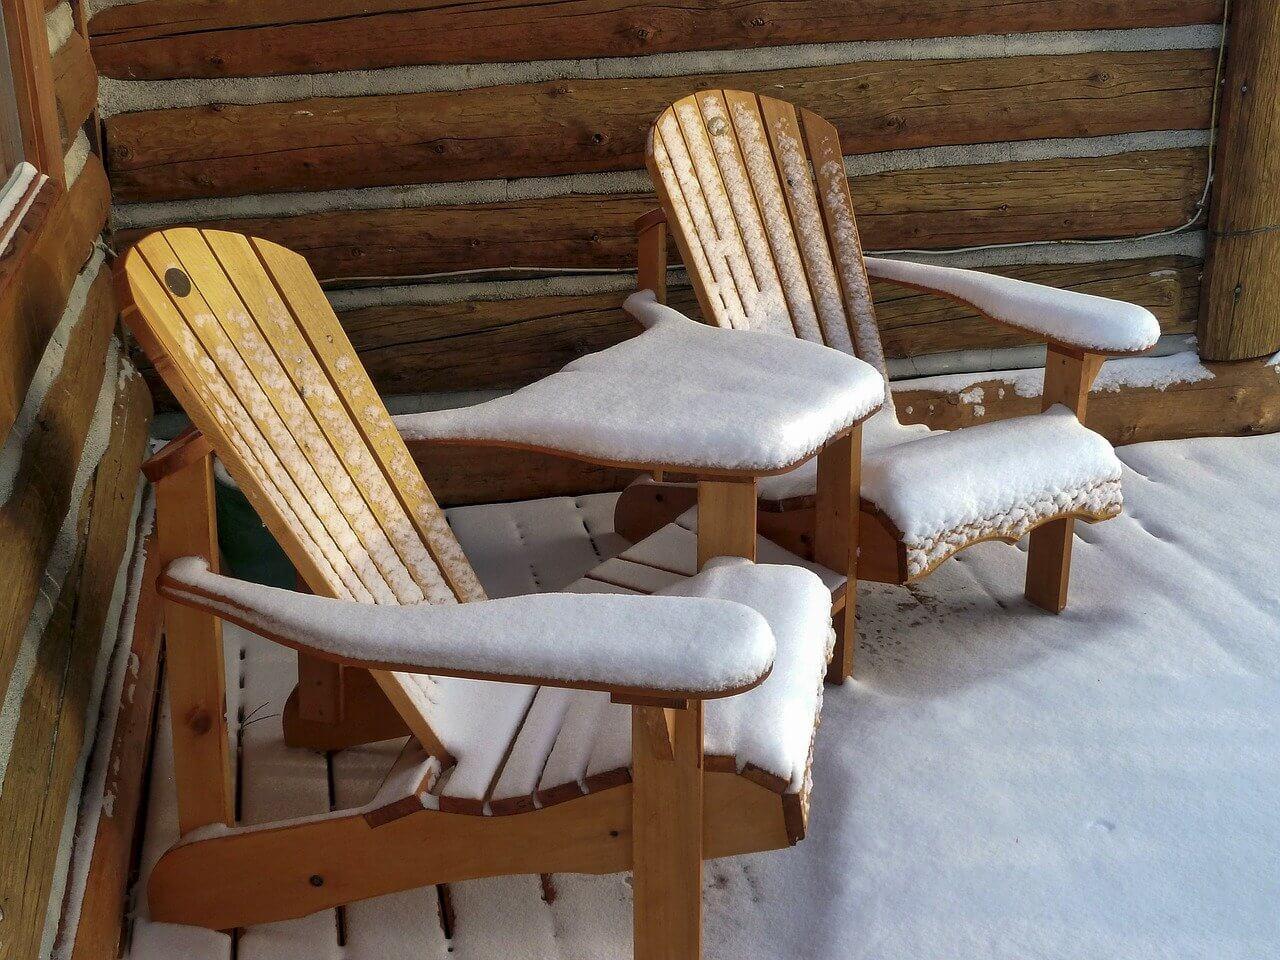 Balkonmoebel-Gartenmoebel-winterfest-machen-Holz-Lack